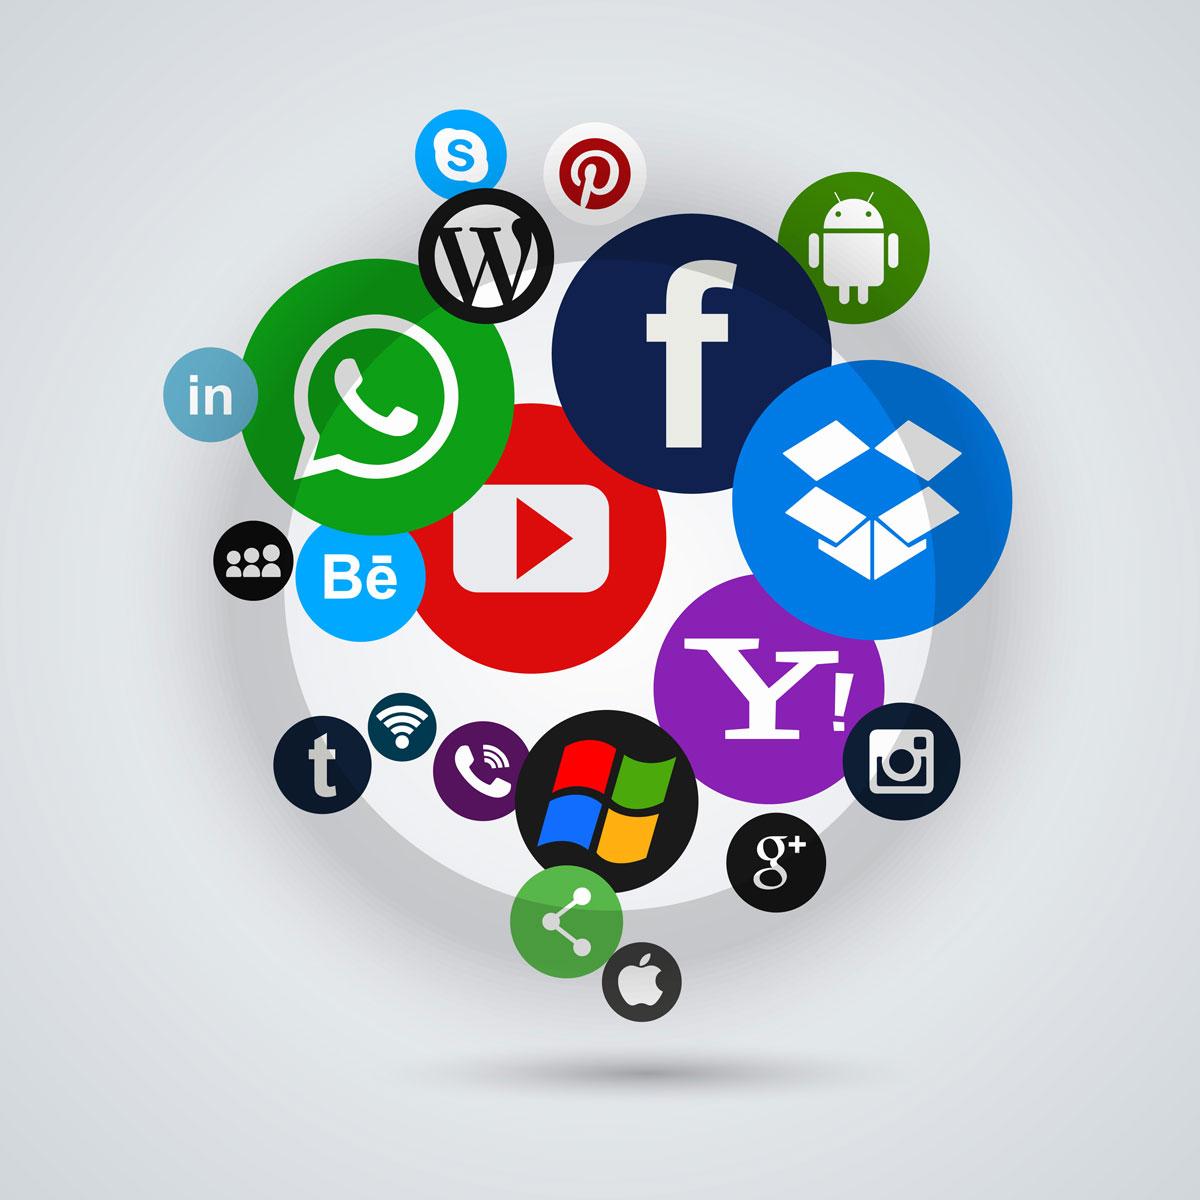 led sign social network - HD1200×1200